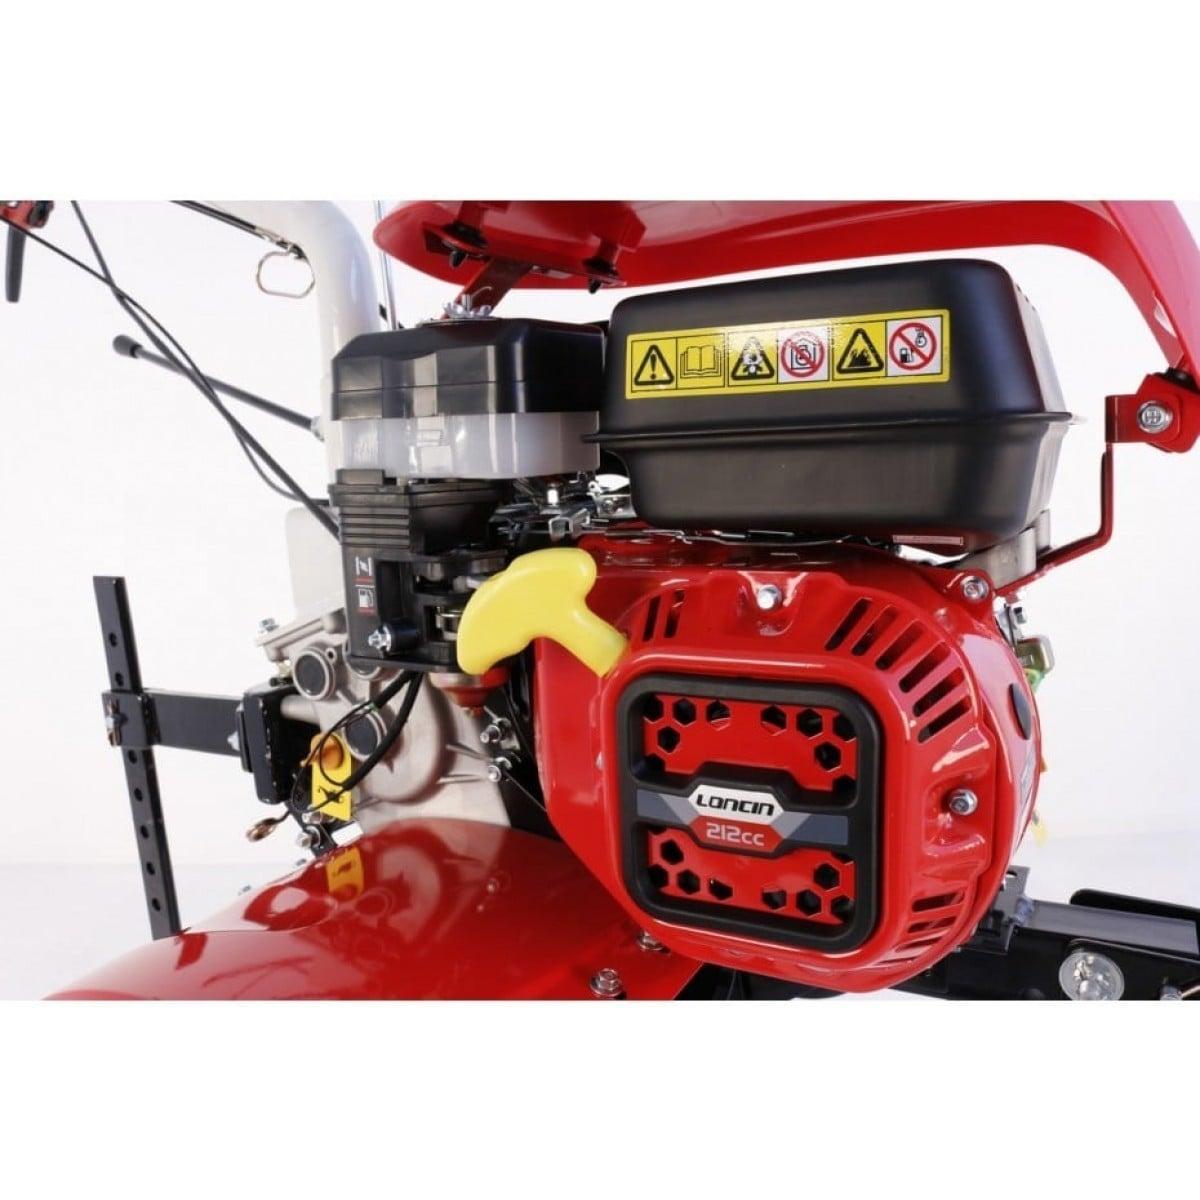 motocultor loncin lc750 7cp o mac.ro 8 2 57